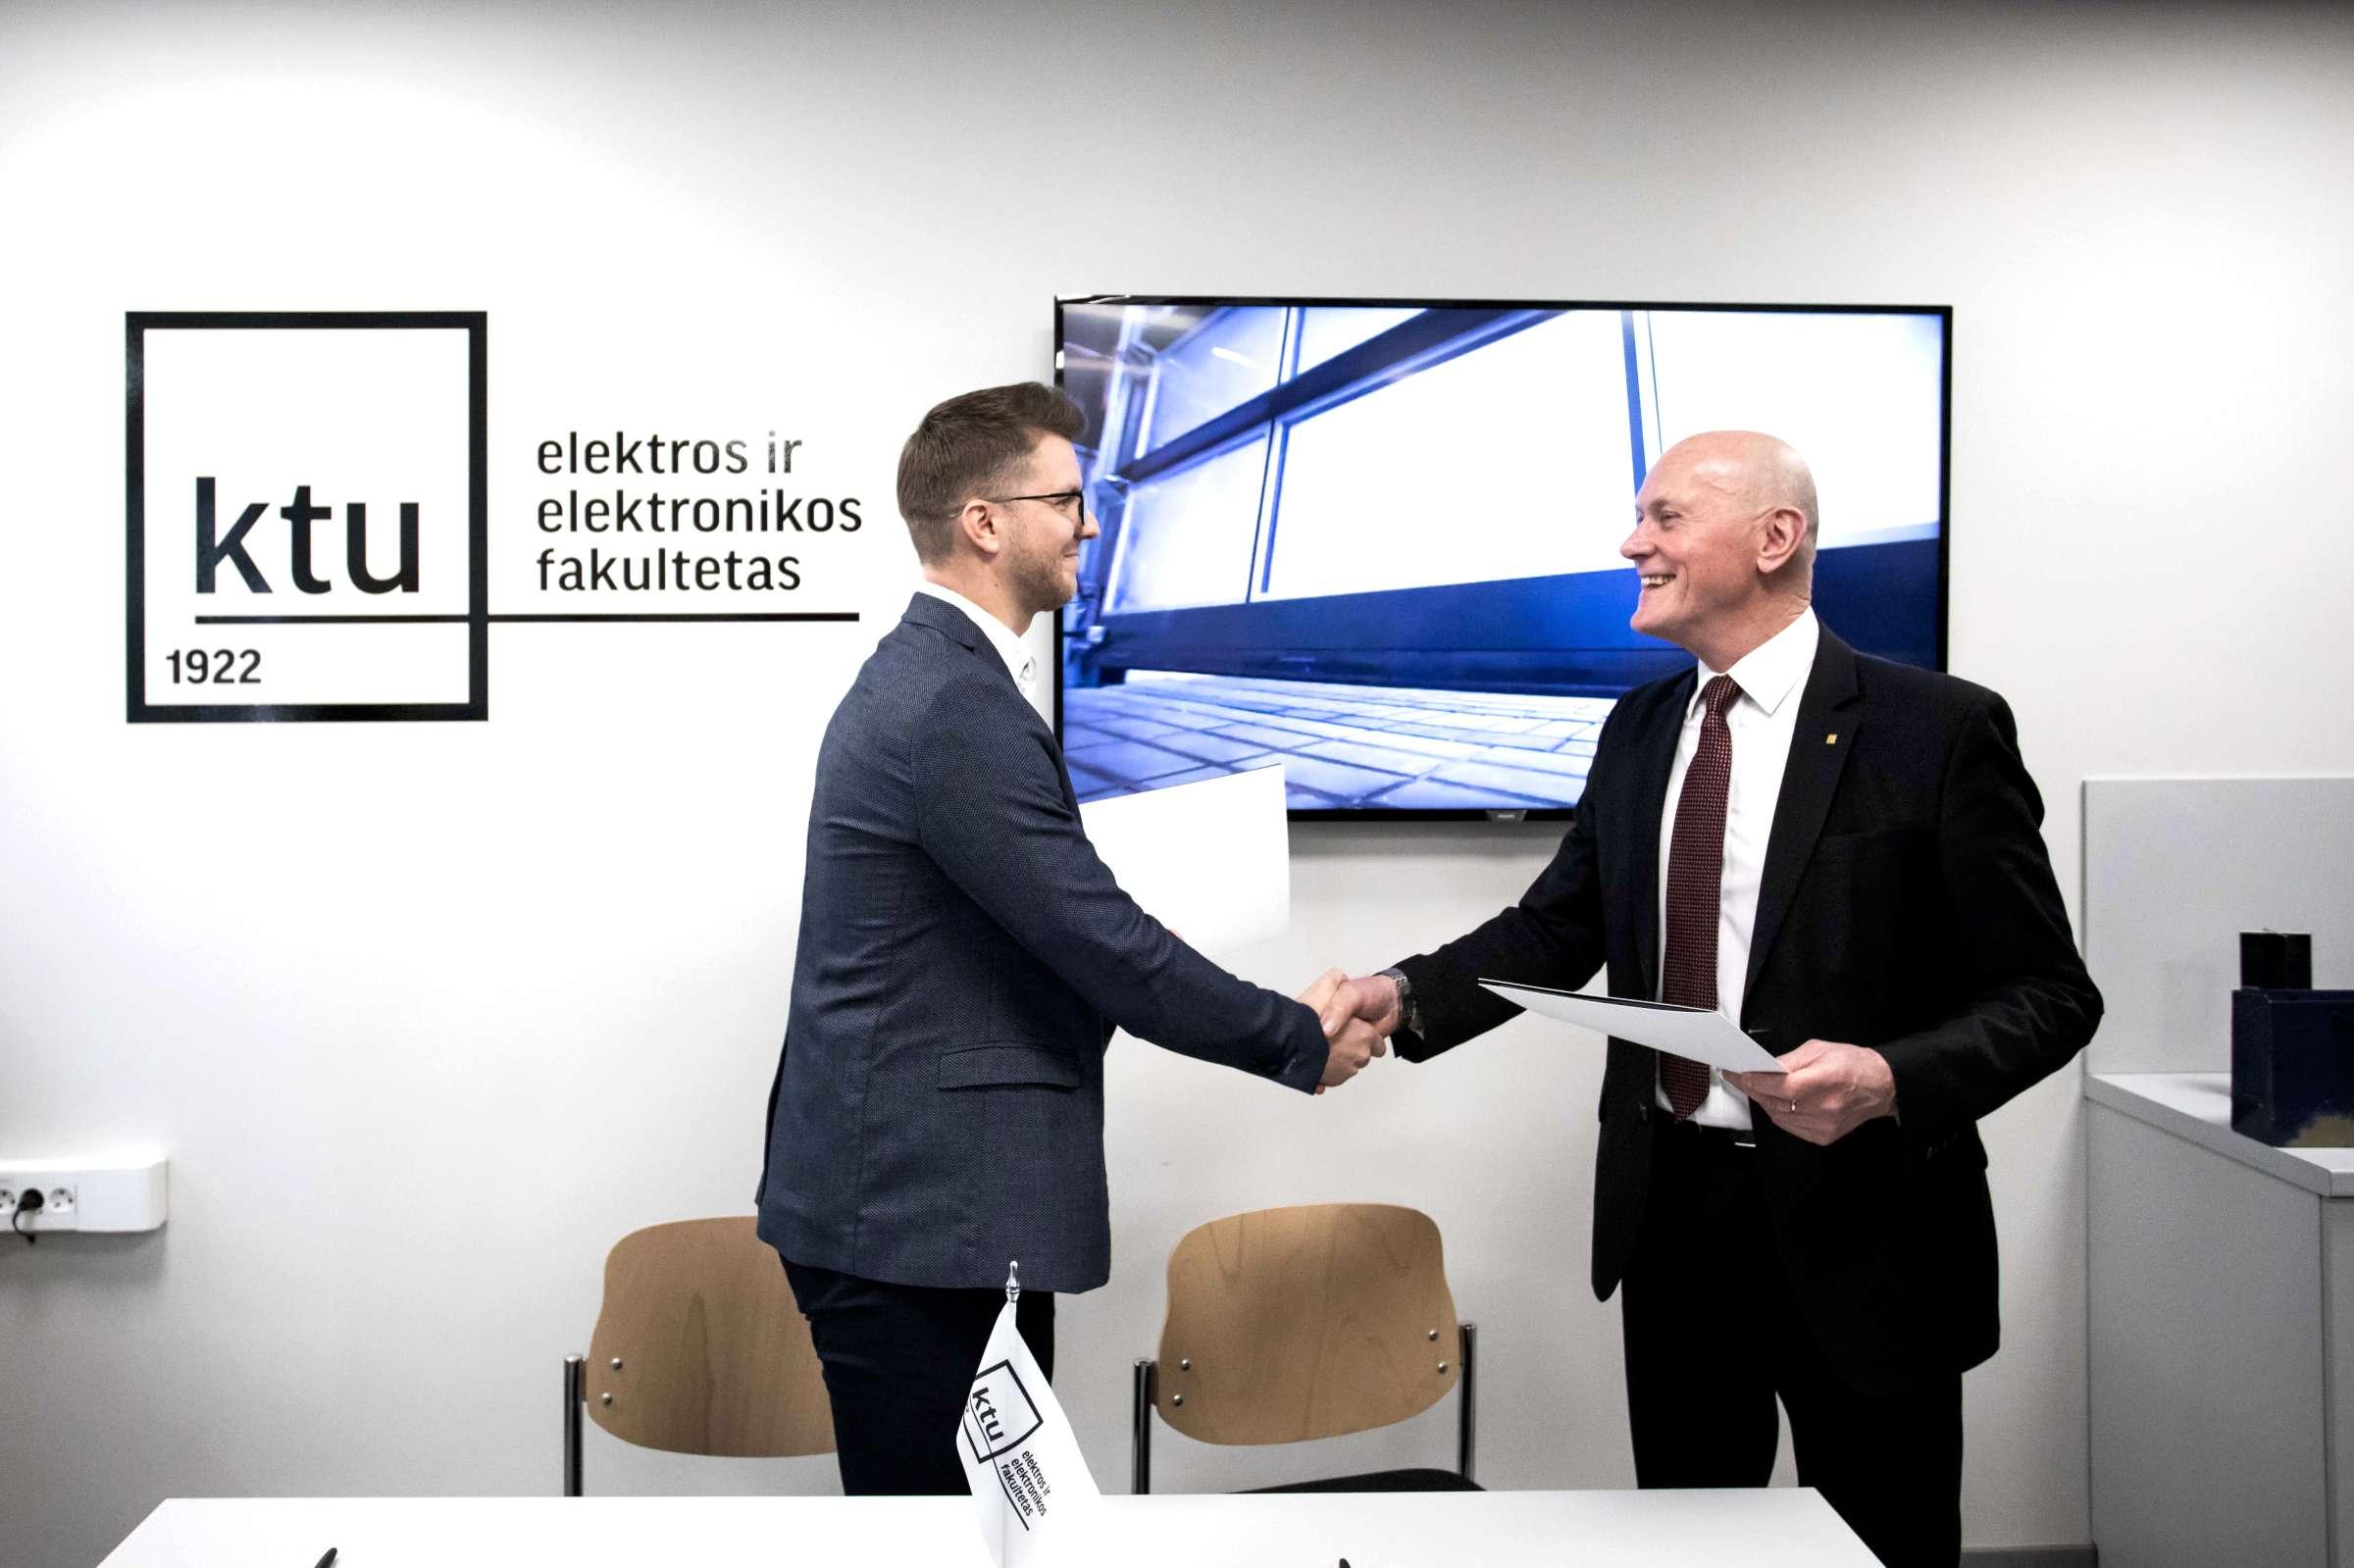 BalticDiag automobilinės elektronikos diagnostikos laboratorija renginio akimirka 3-2400